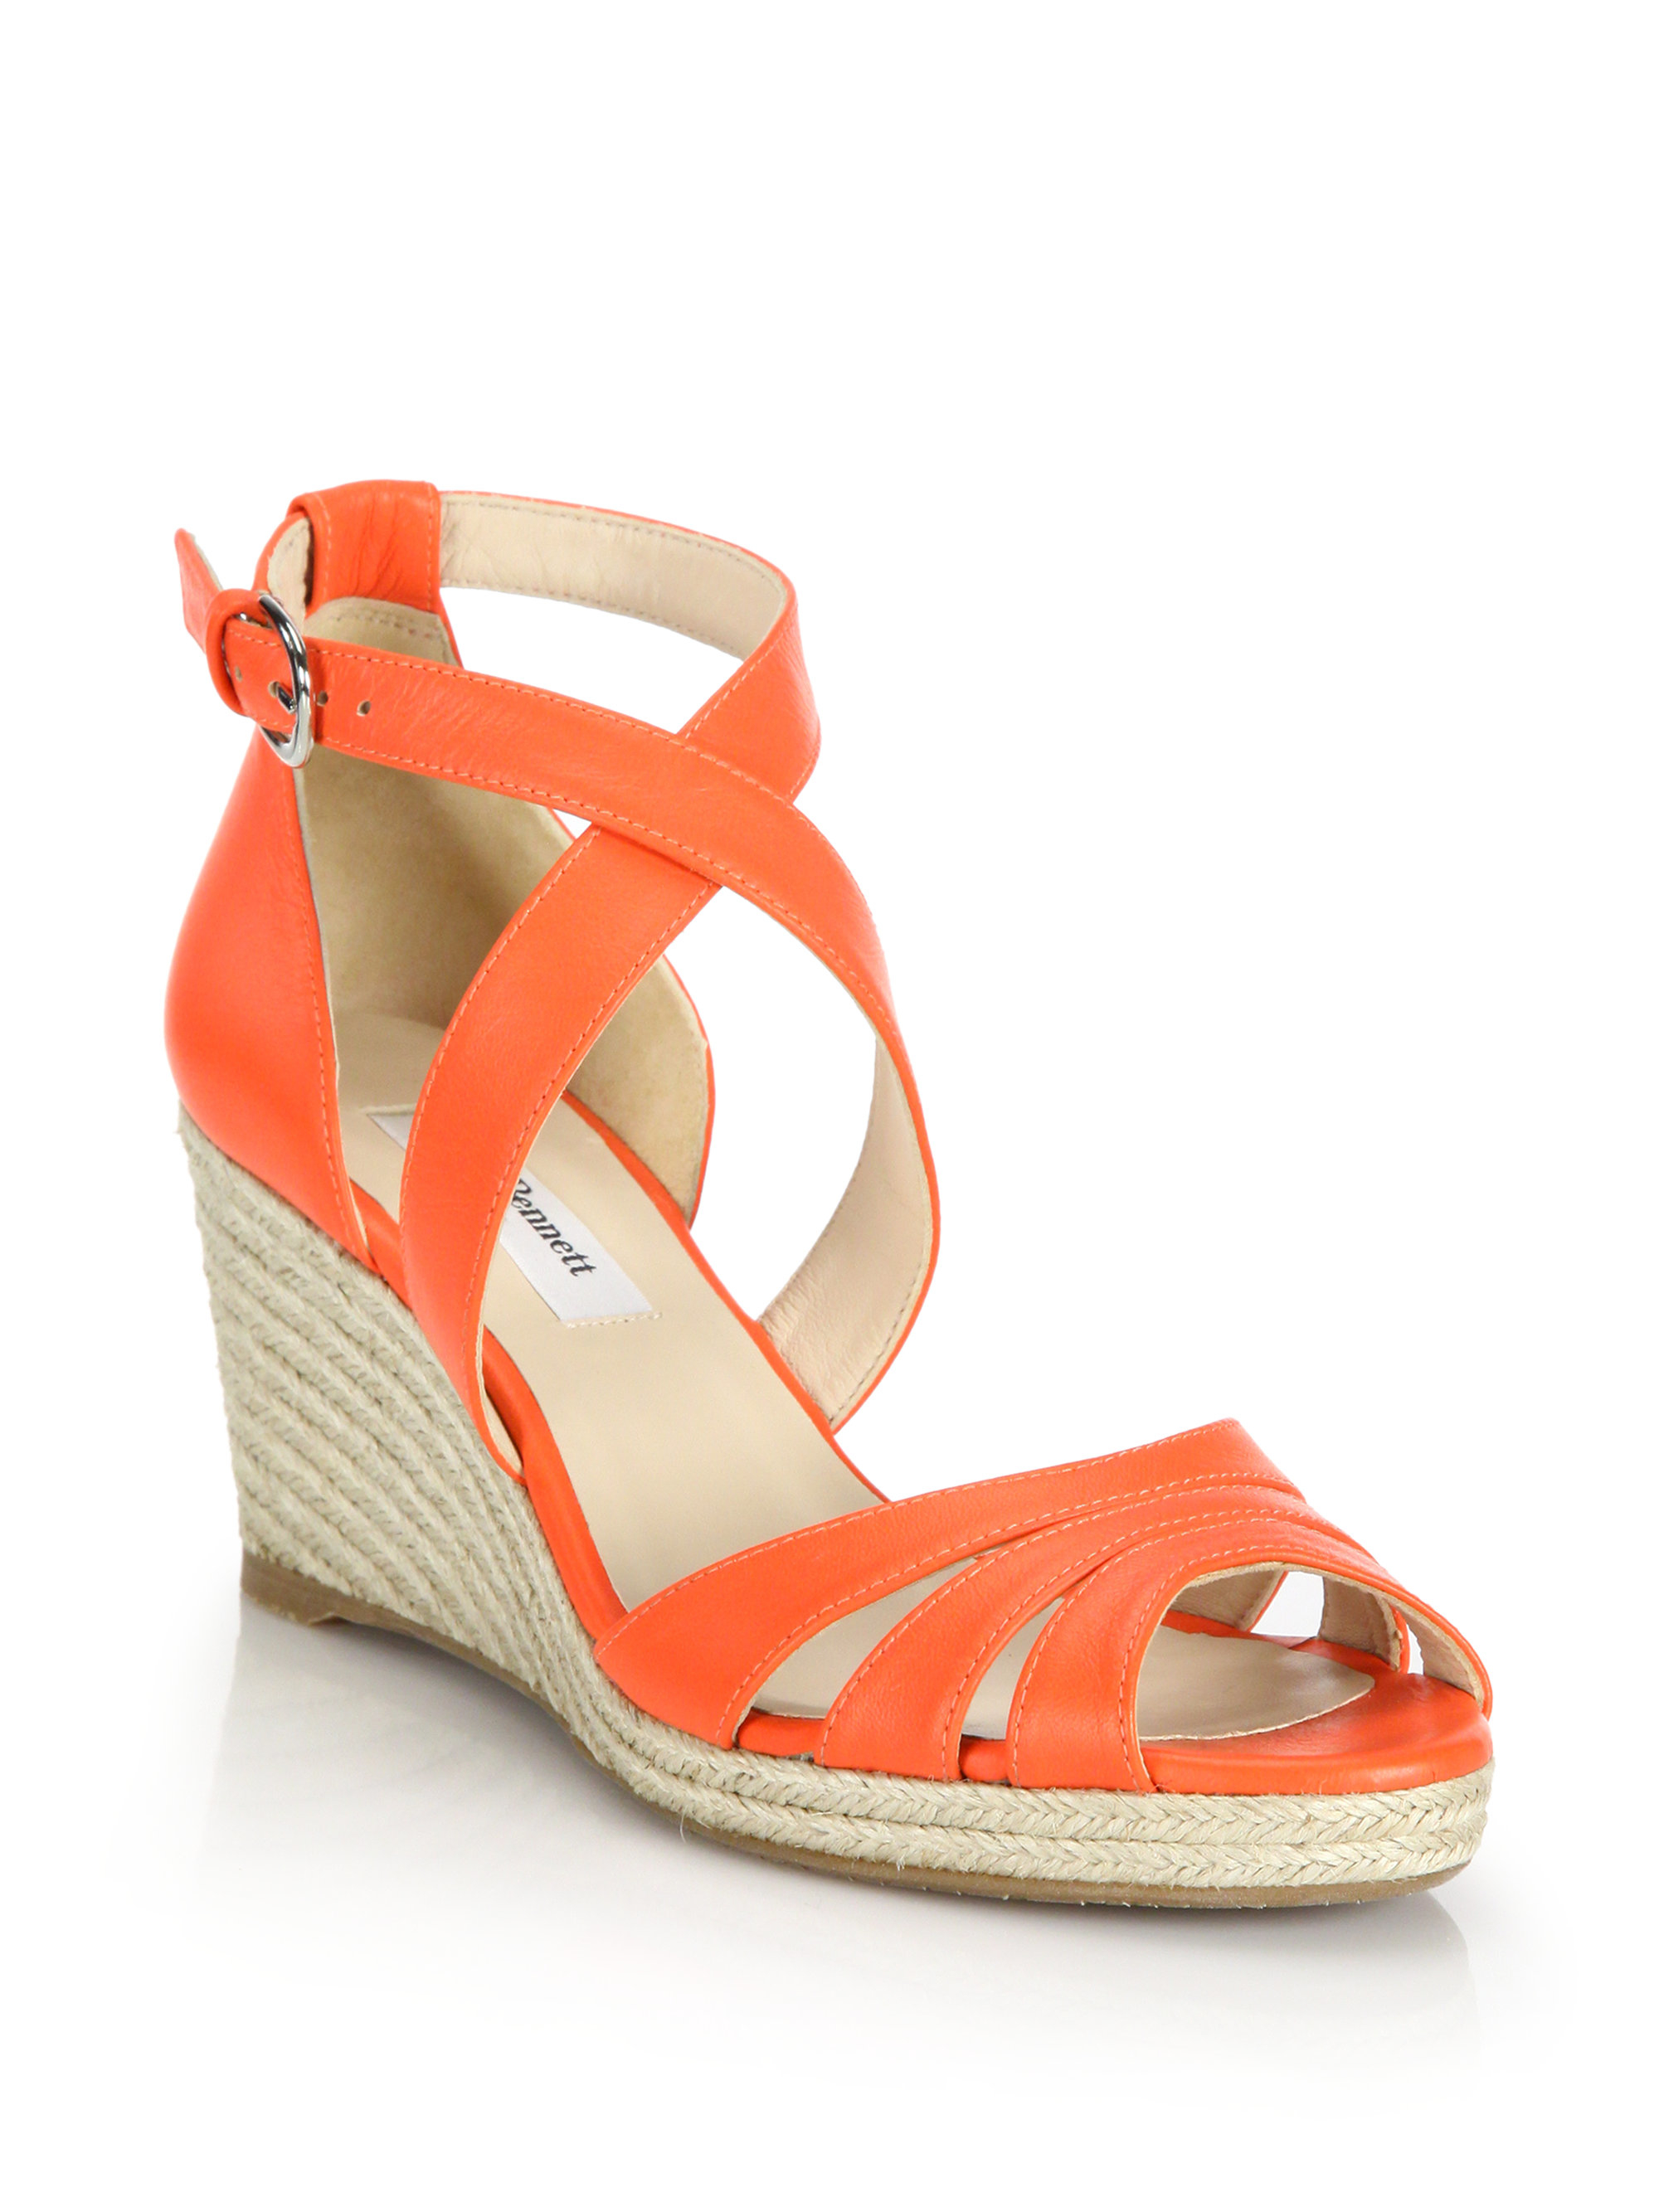 d9c9ad3339d Lyst - L.K.Bennett Priya Leather Espadrille Wedge Sandals in Orange